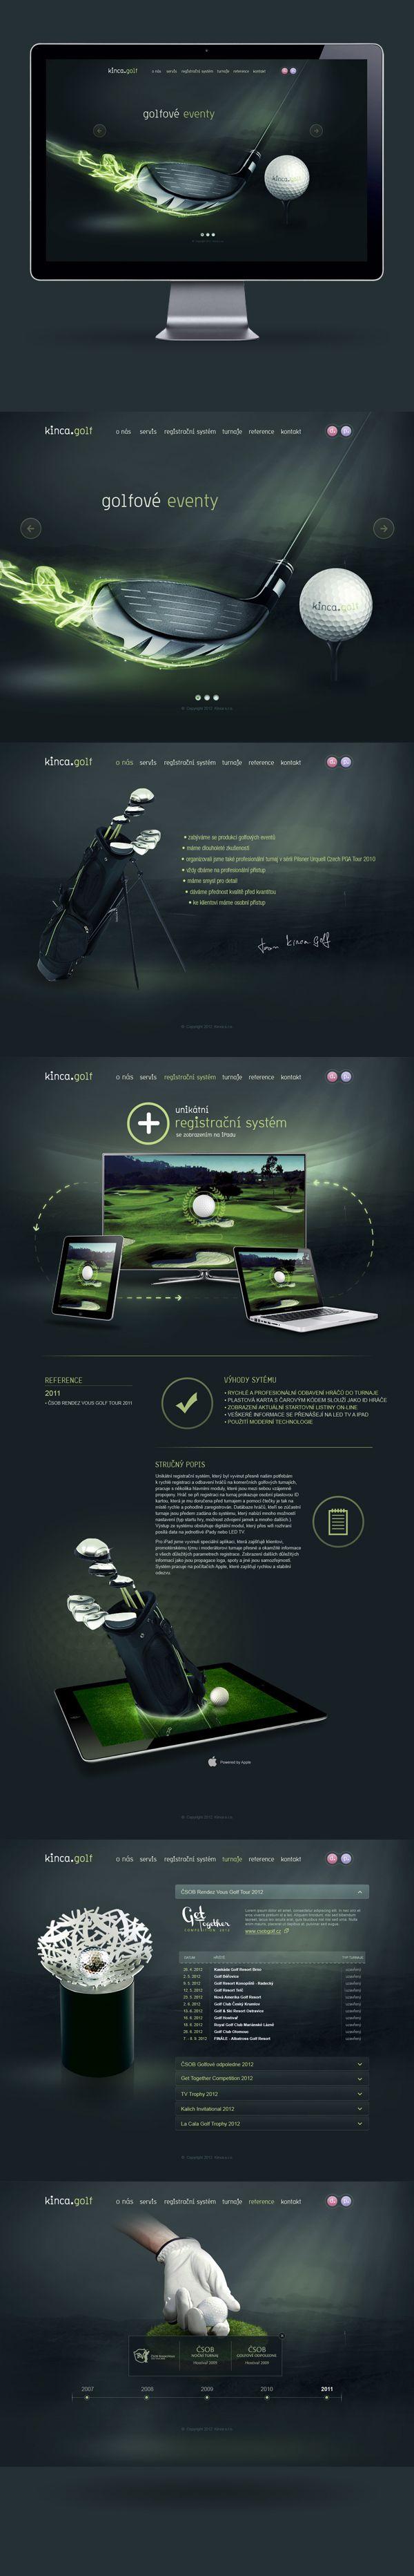 kinca.golf on Web Design Served